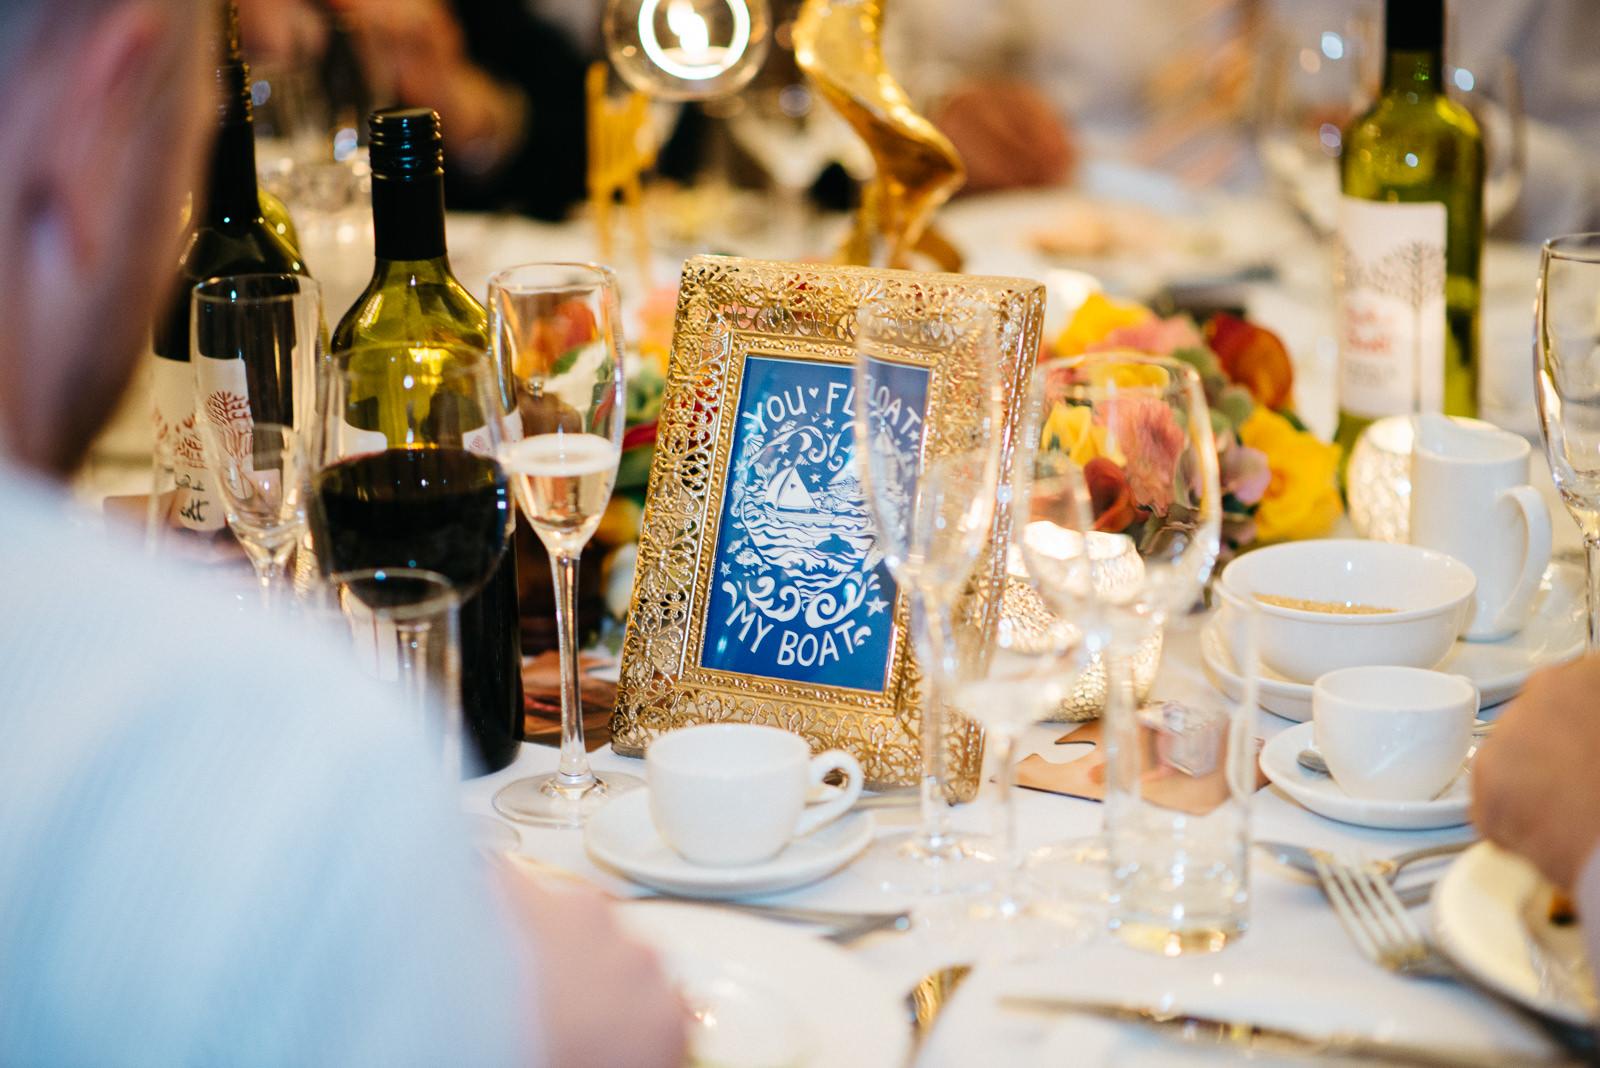 Stylish naval theme table decor at alternative wedding at the Pump House